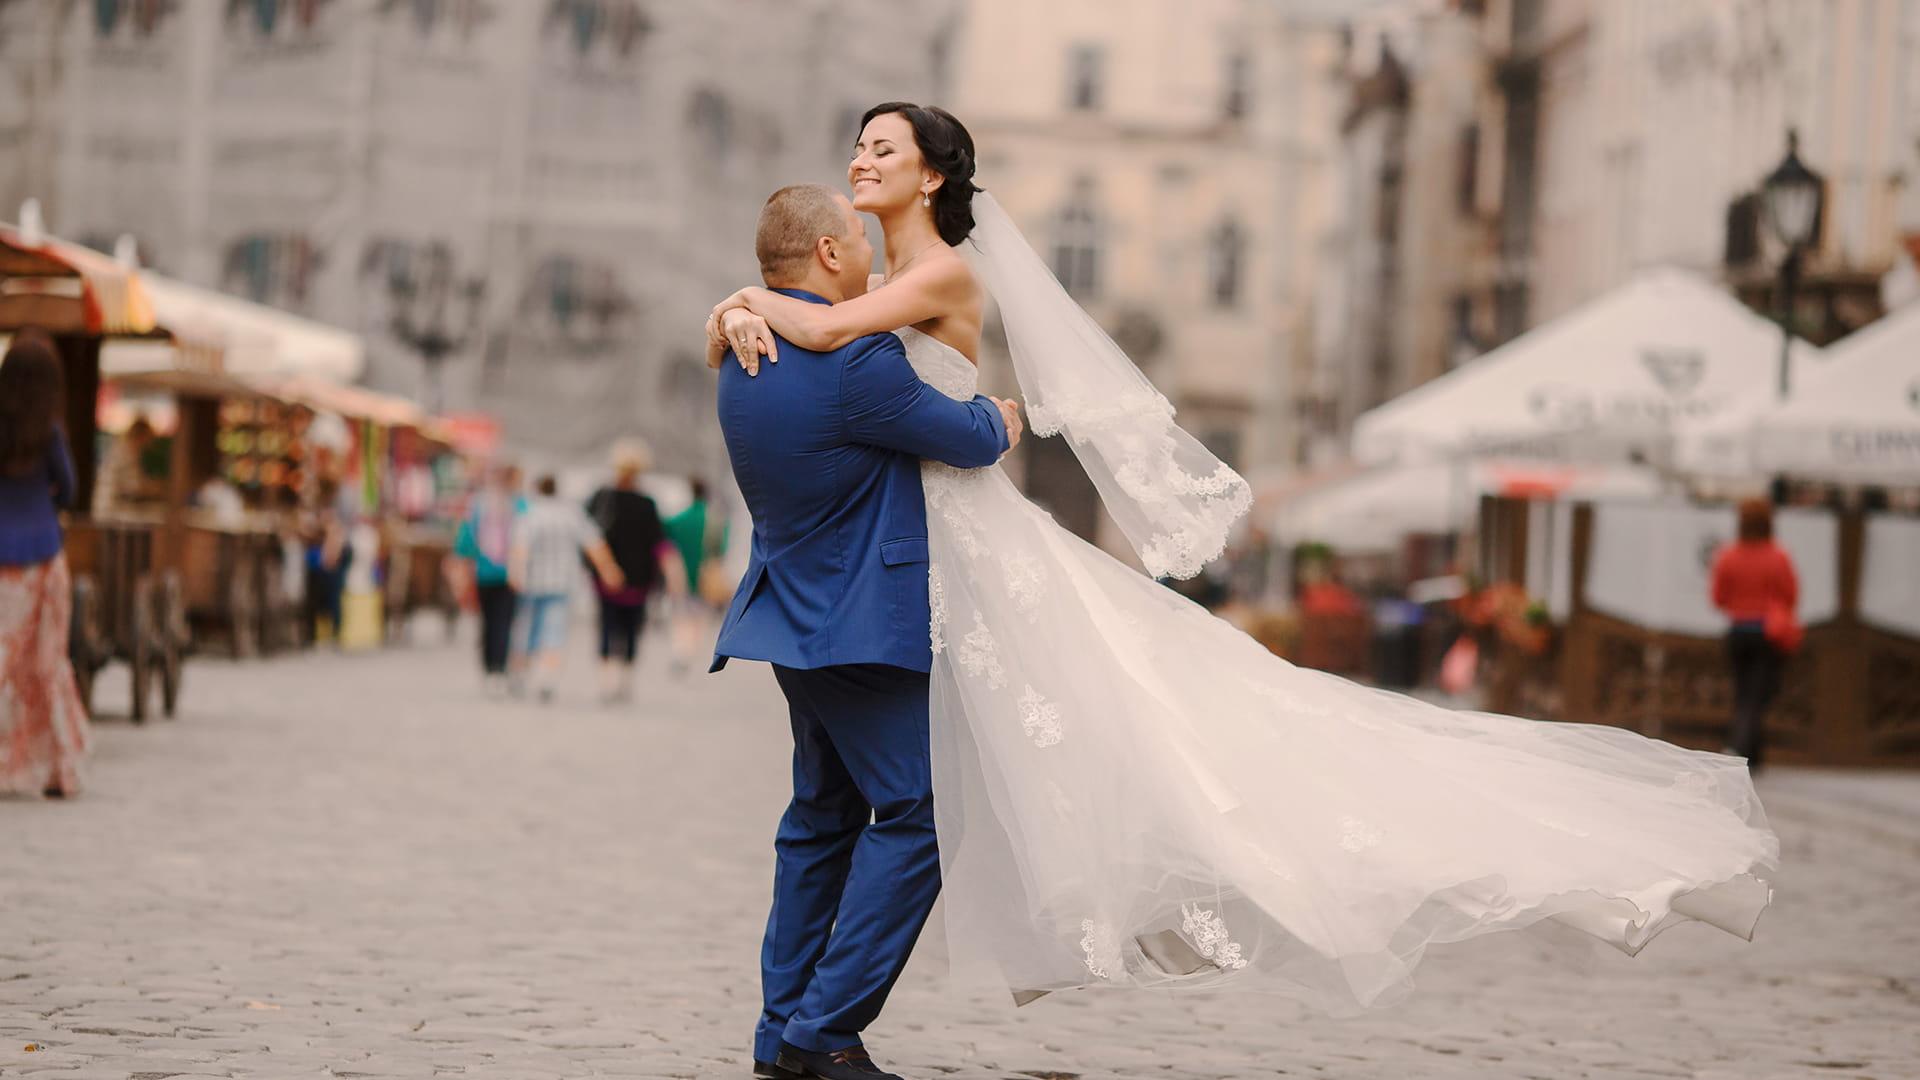 Melisa & Ingrid : Wonderful Fall Wedding at The Warehouse